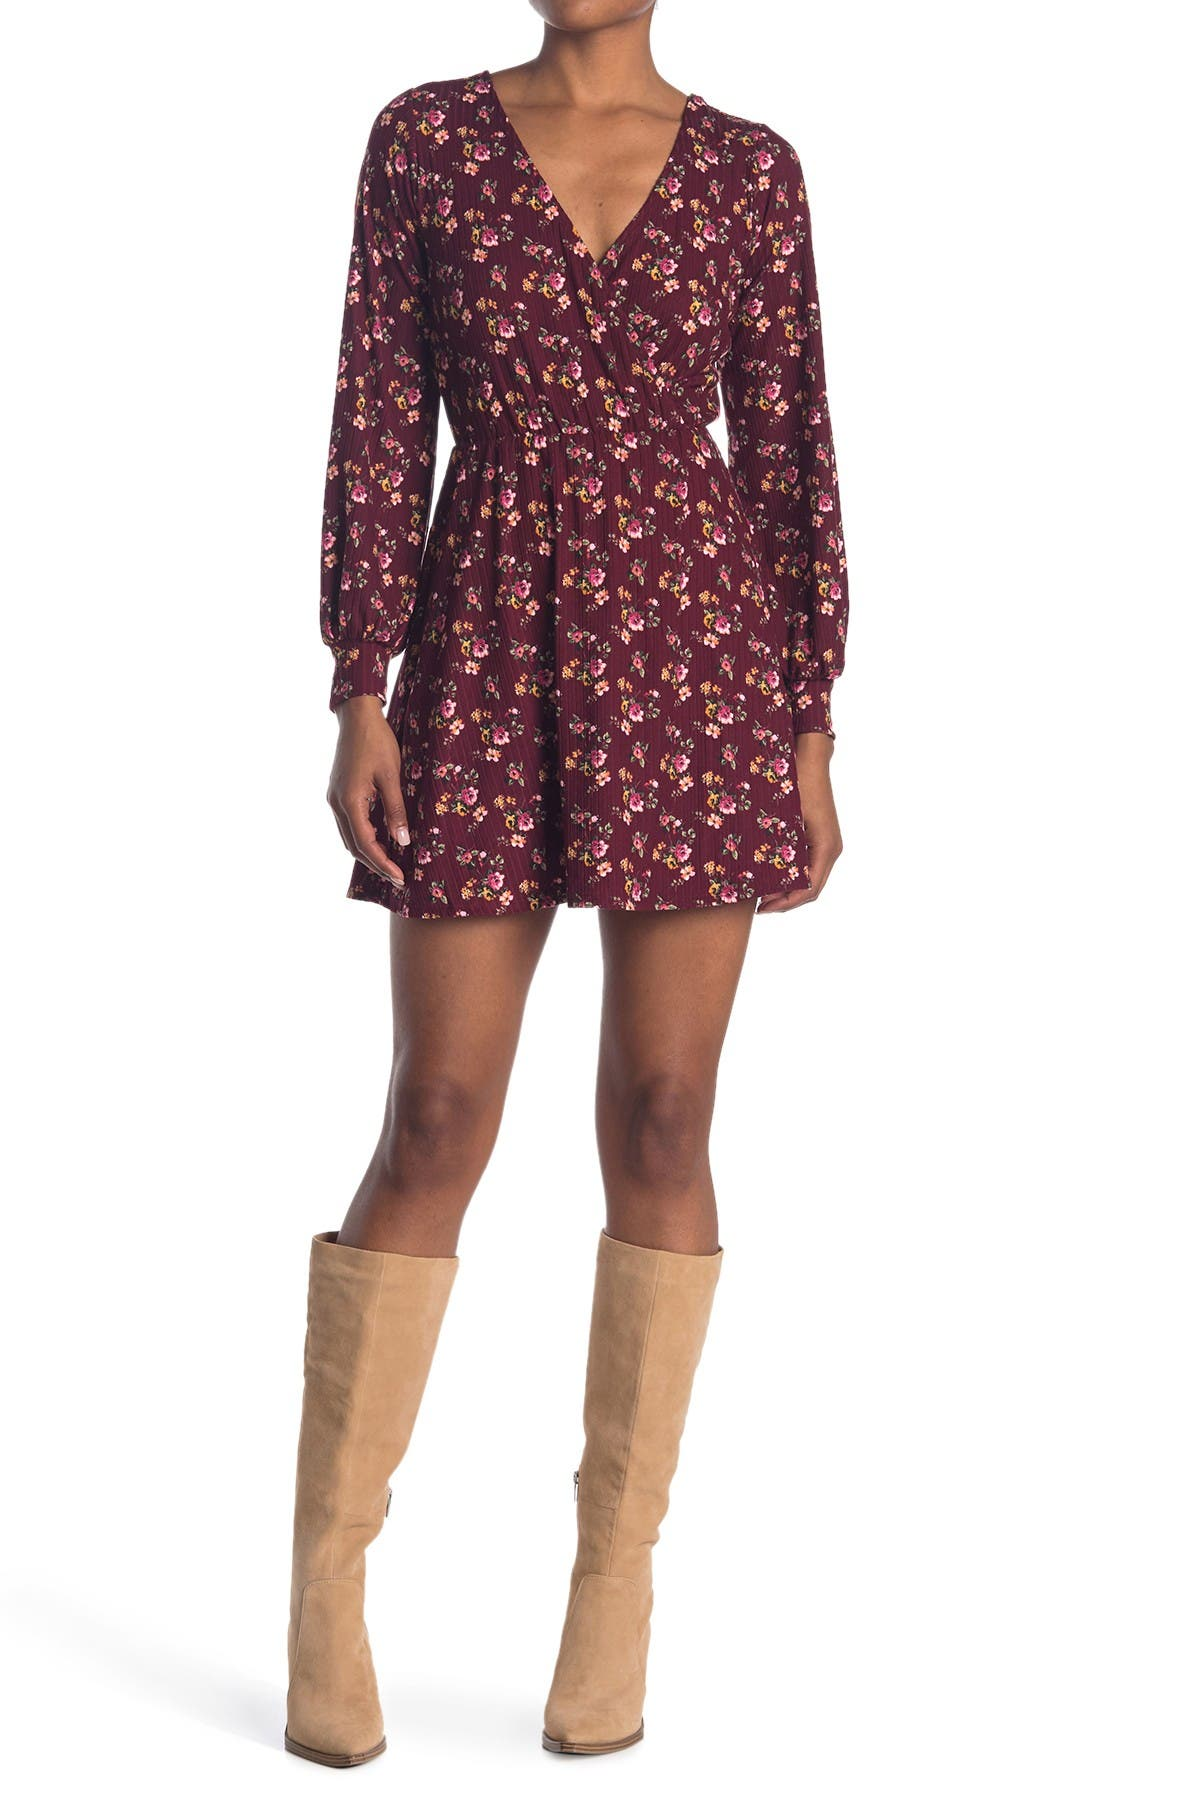 Image of KENEDIK Ditsy Surplice Long Sleeve Rib Knit Dress